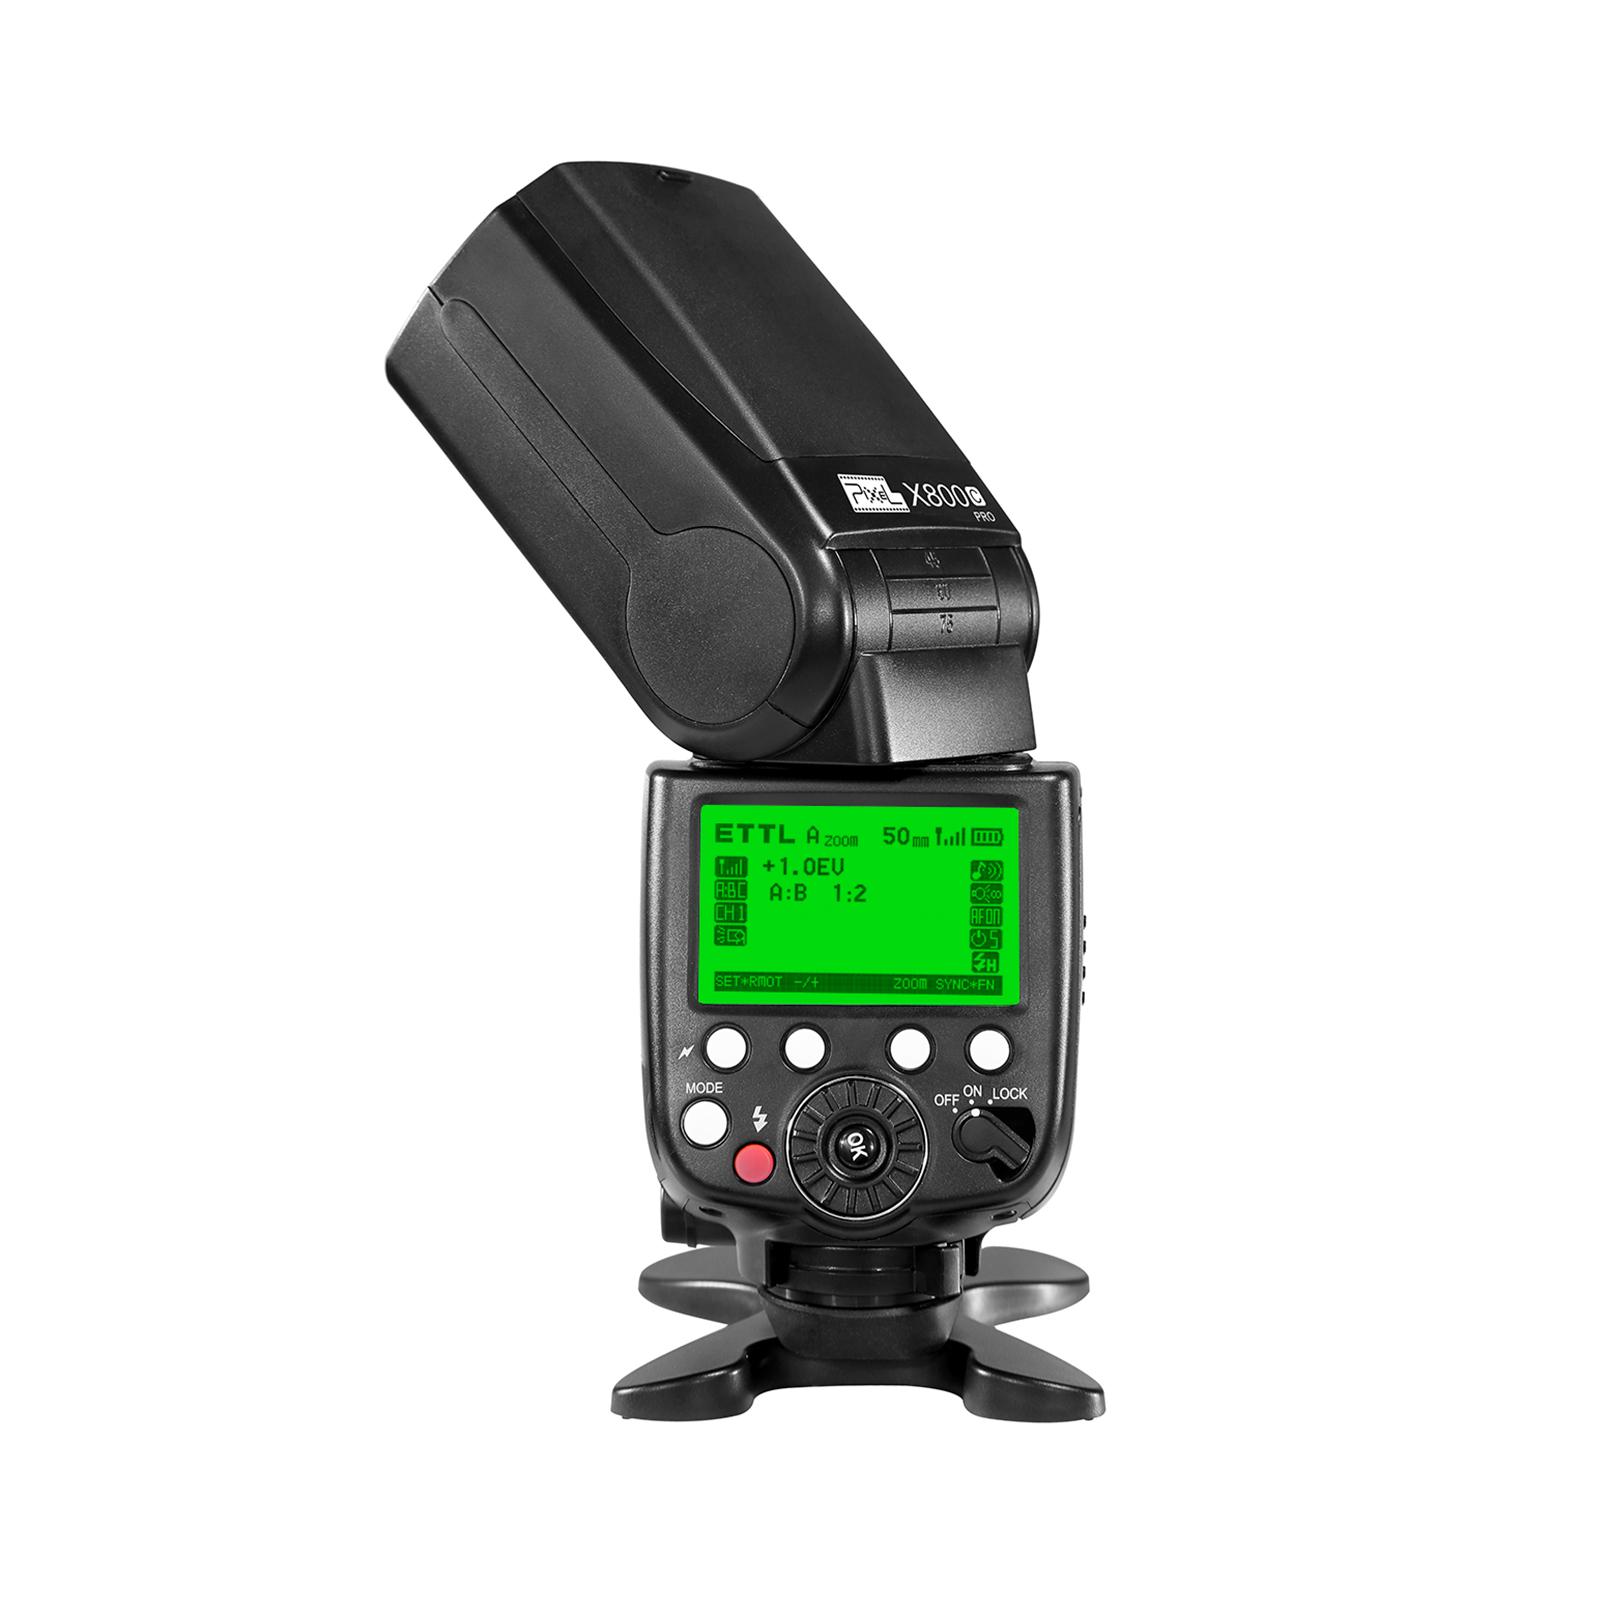 Pixel X800C PRO Speedlite, high speed synchronization and powerful performance.